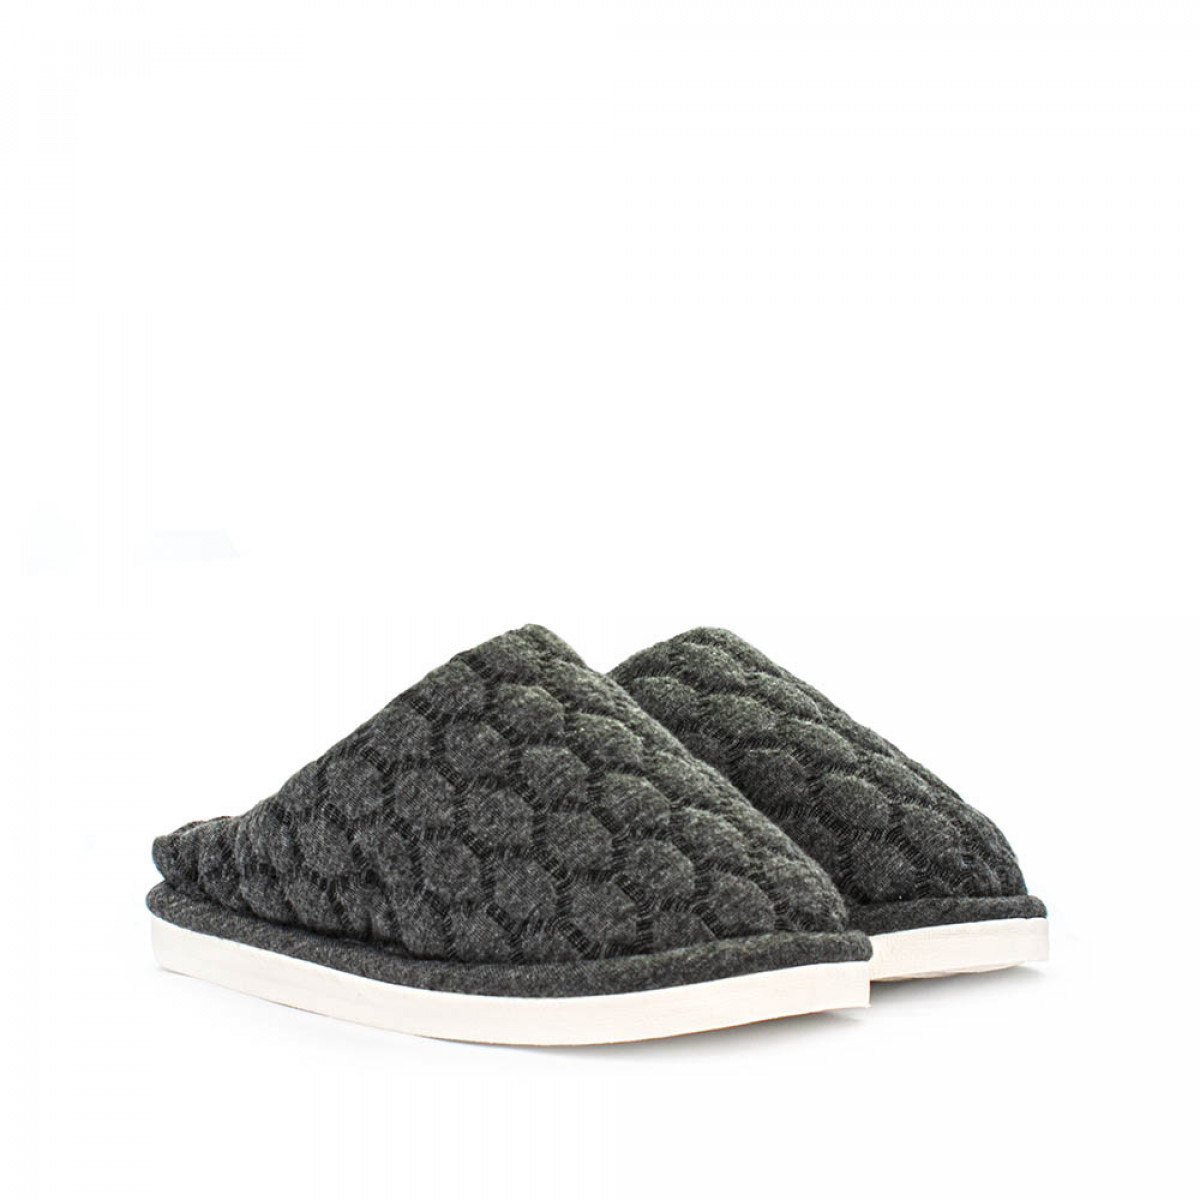 Kid's home slippers FAMILY, Gray